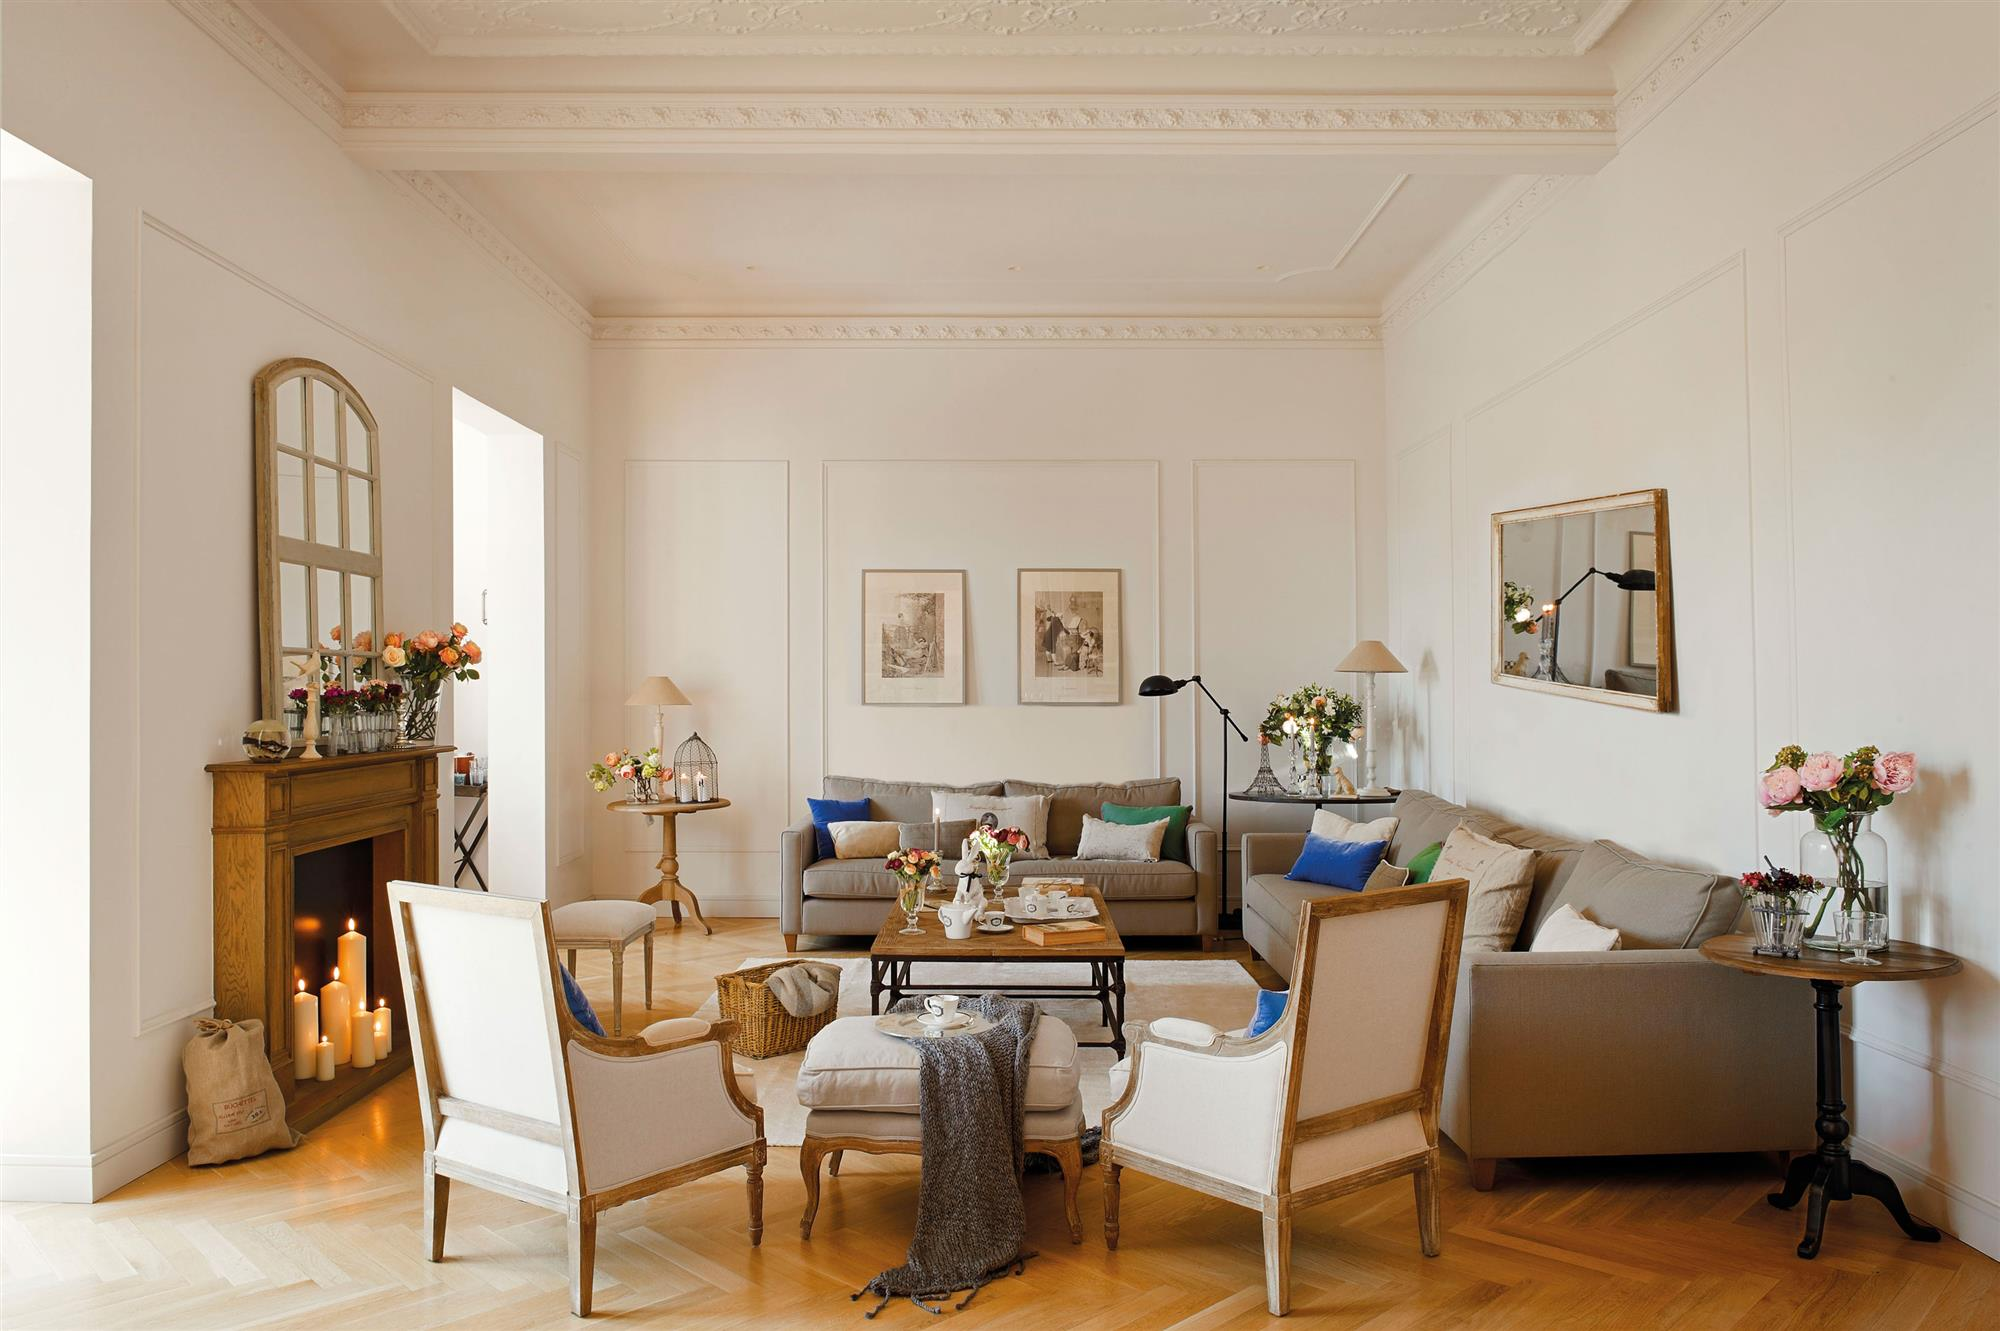 Parquet en espiga - Como decorar un salon en forma de l ...